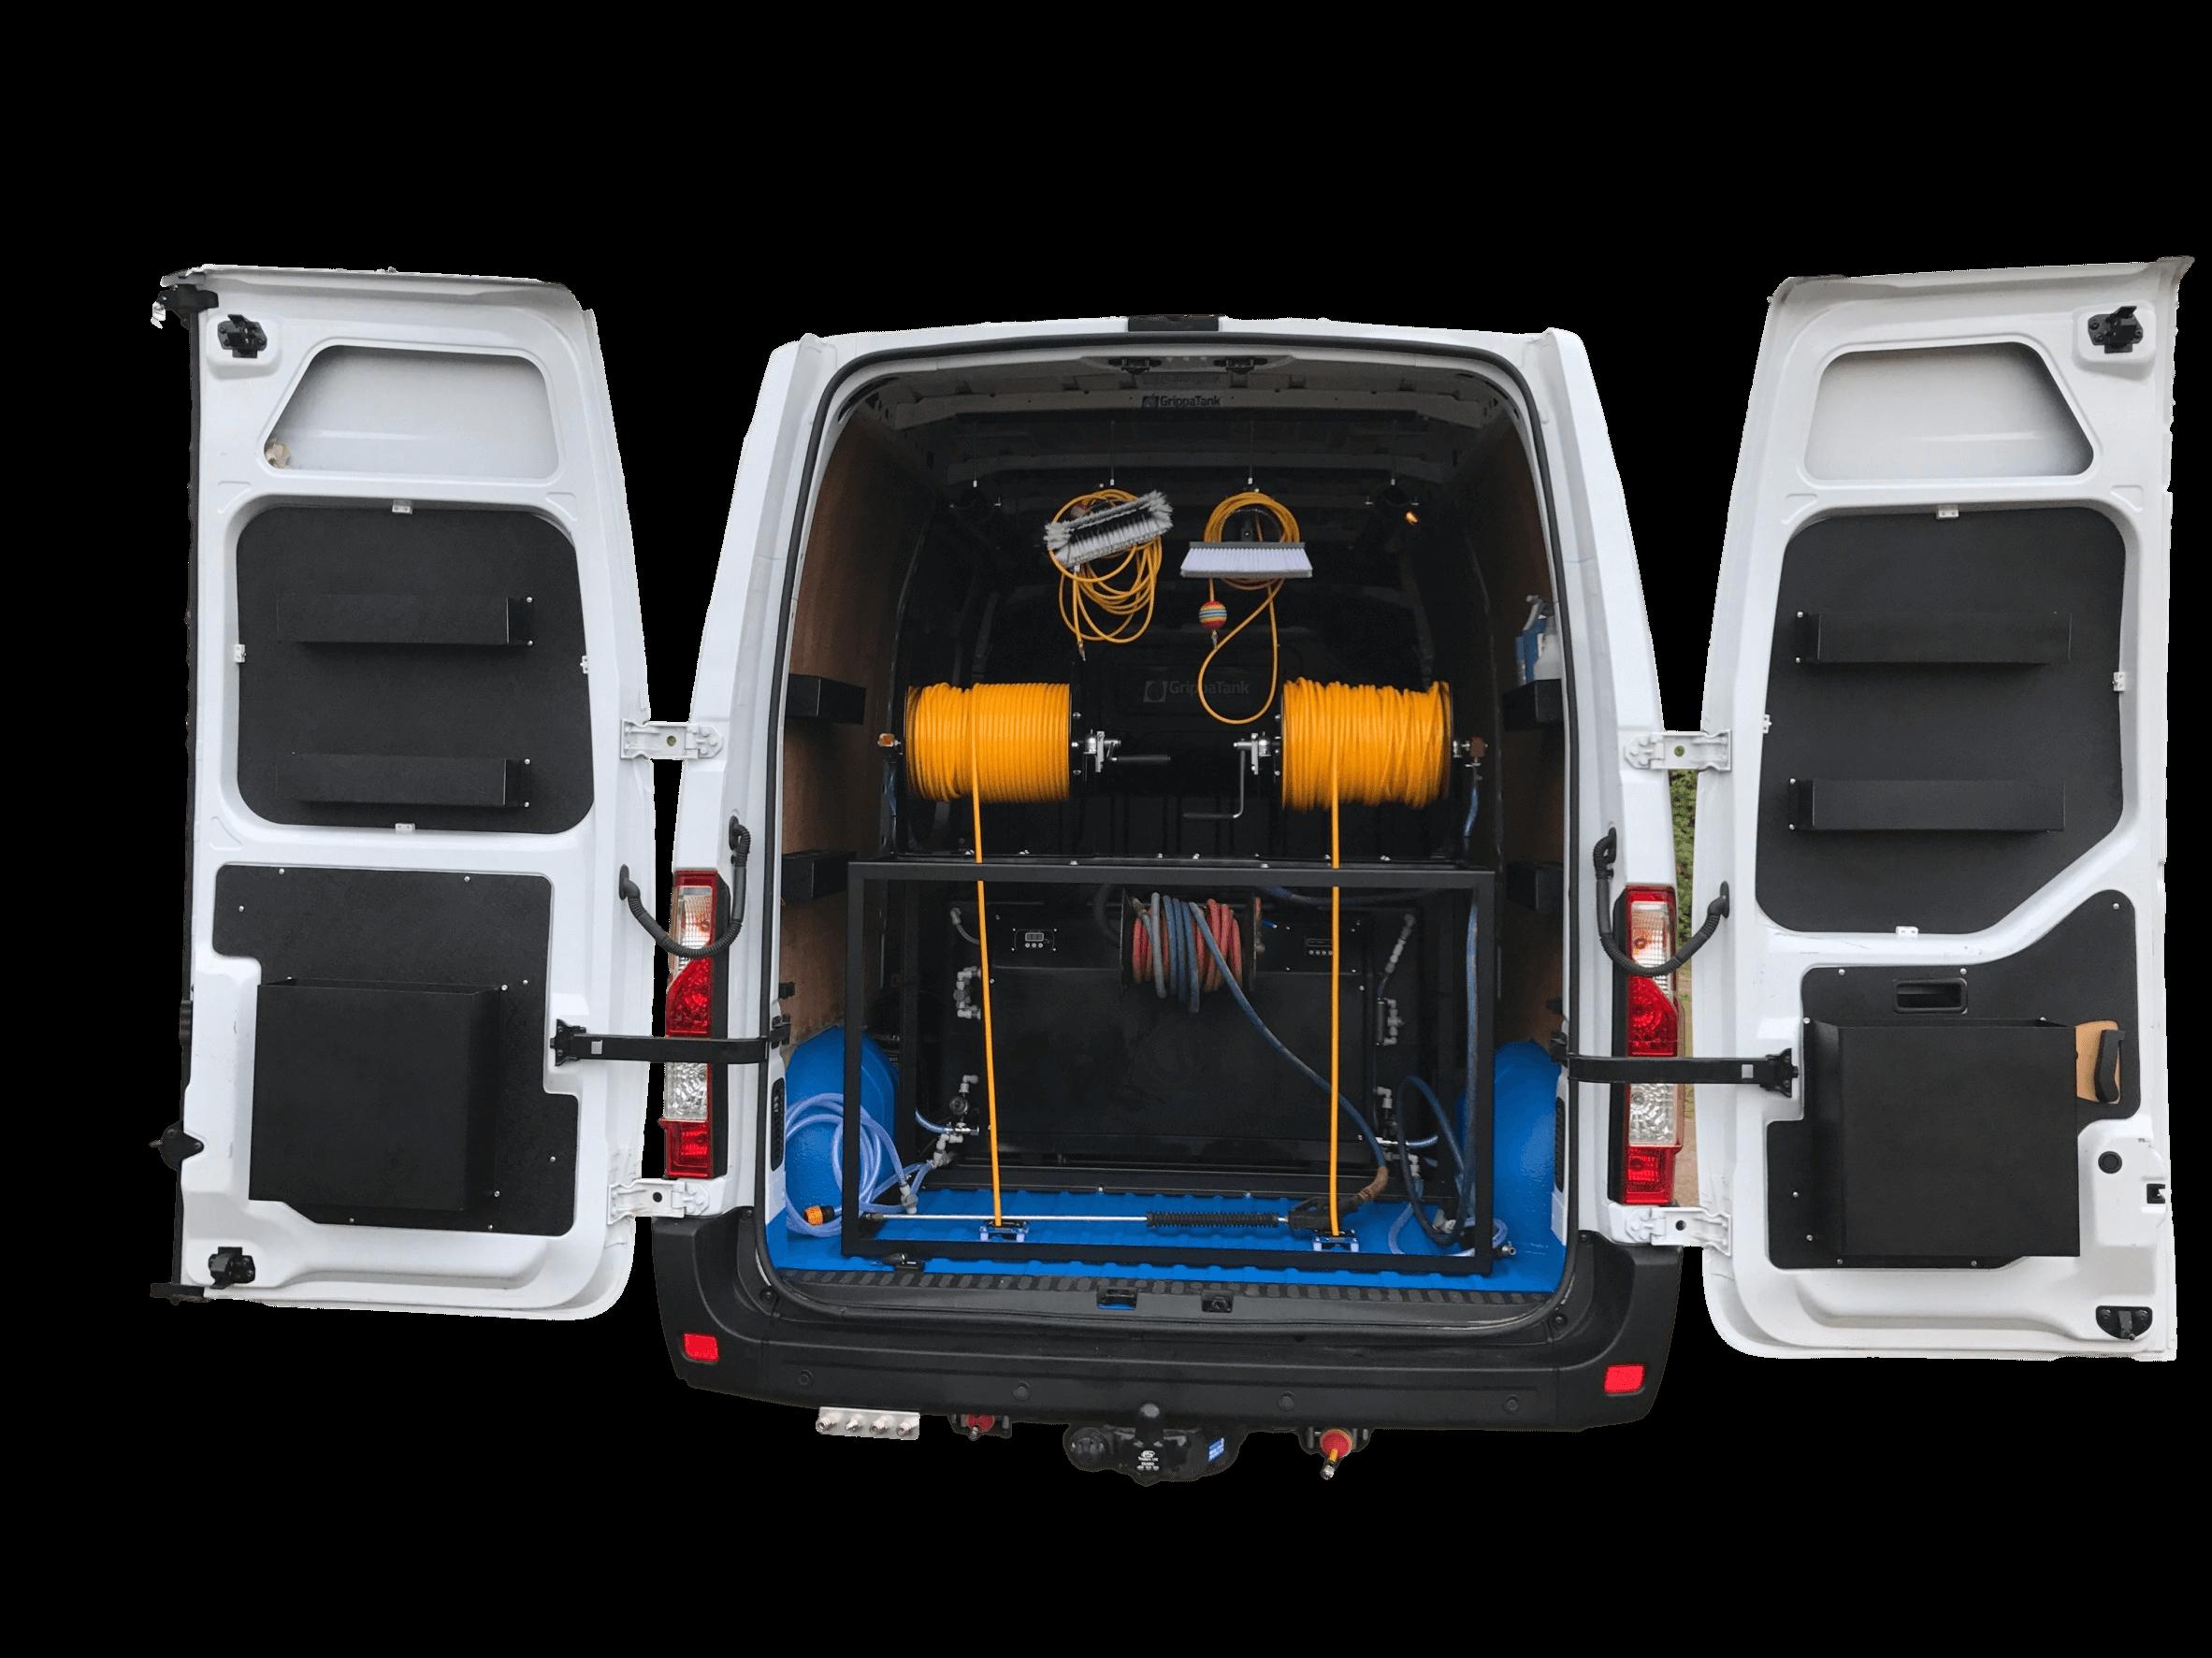 GrippaJET Vehicle Mount Pressure Washer Systems